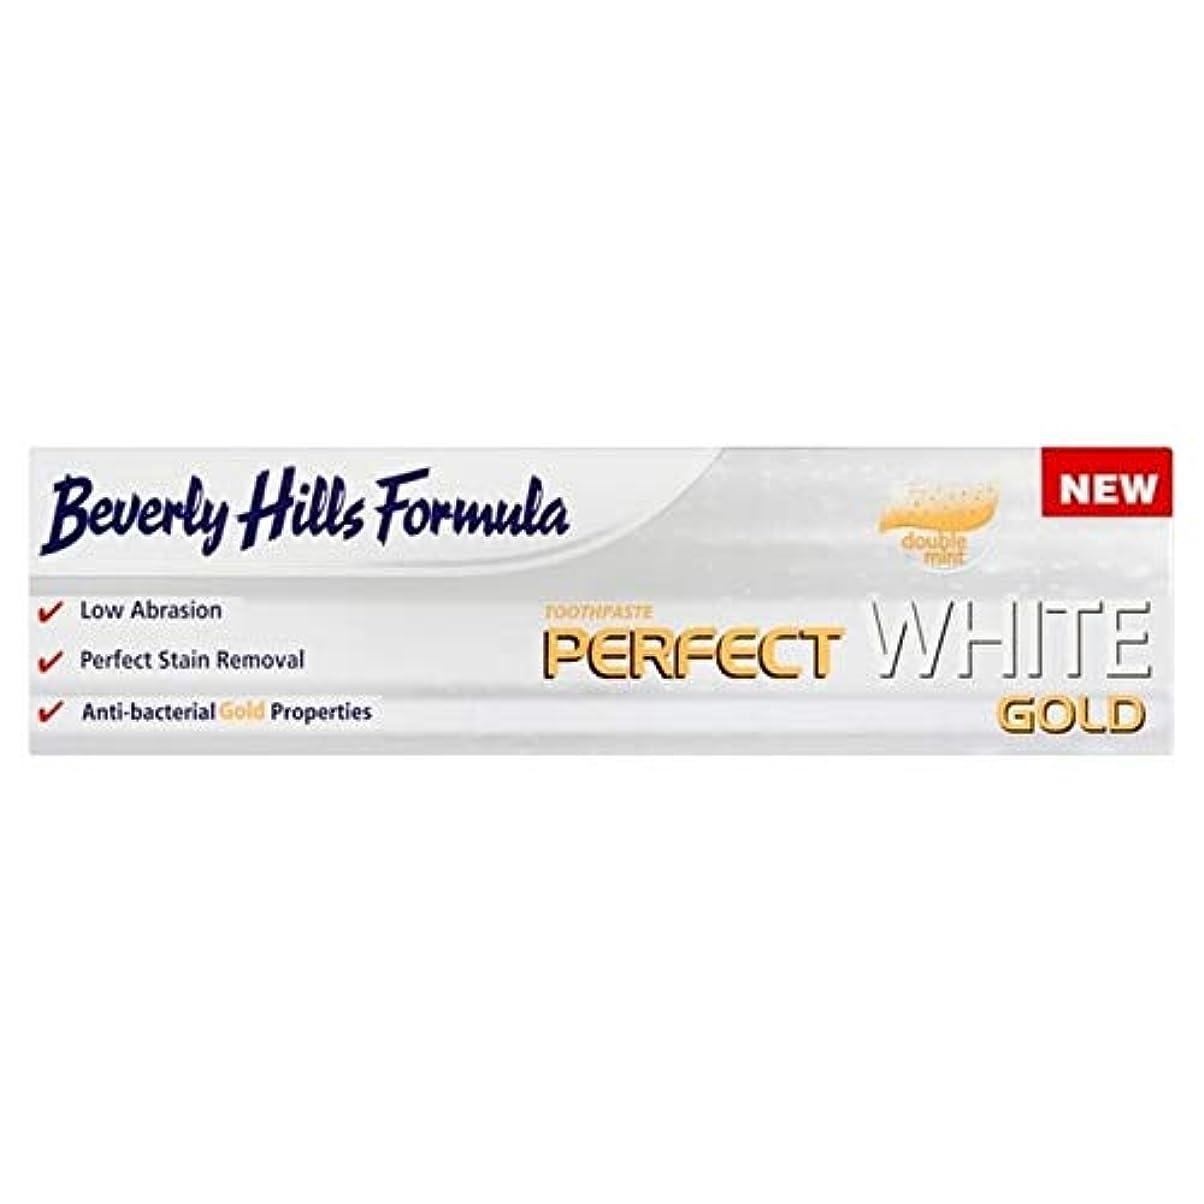 [Beverly Hills ] ビバリーヒルズ公式パーフェクトホワイトゴールドの100ミリリットル - Beverly Hills Formula Perfect White Gold 100ml [並行輸入品]